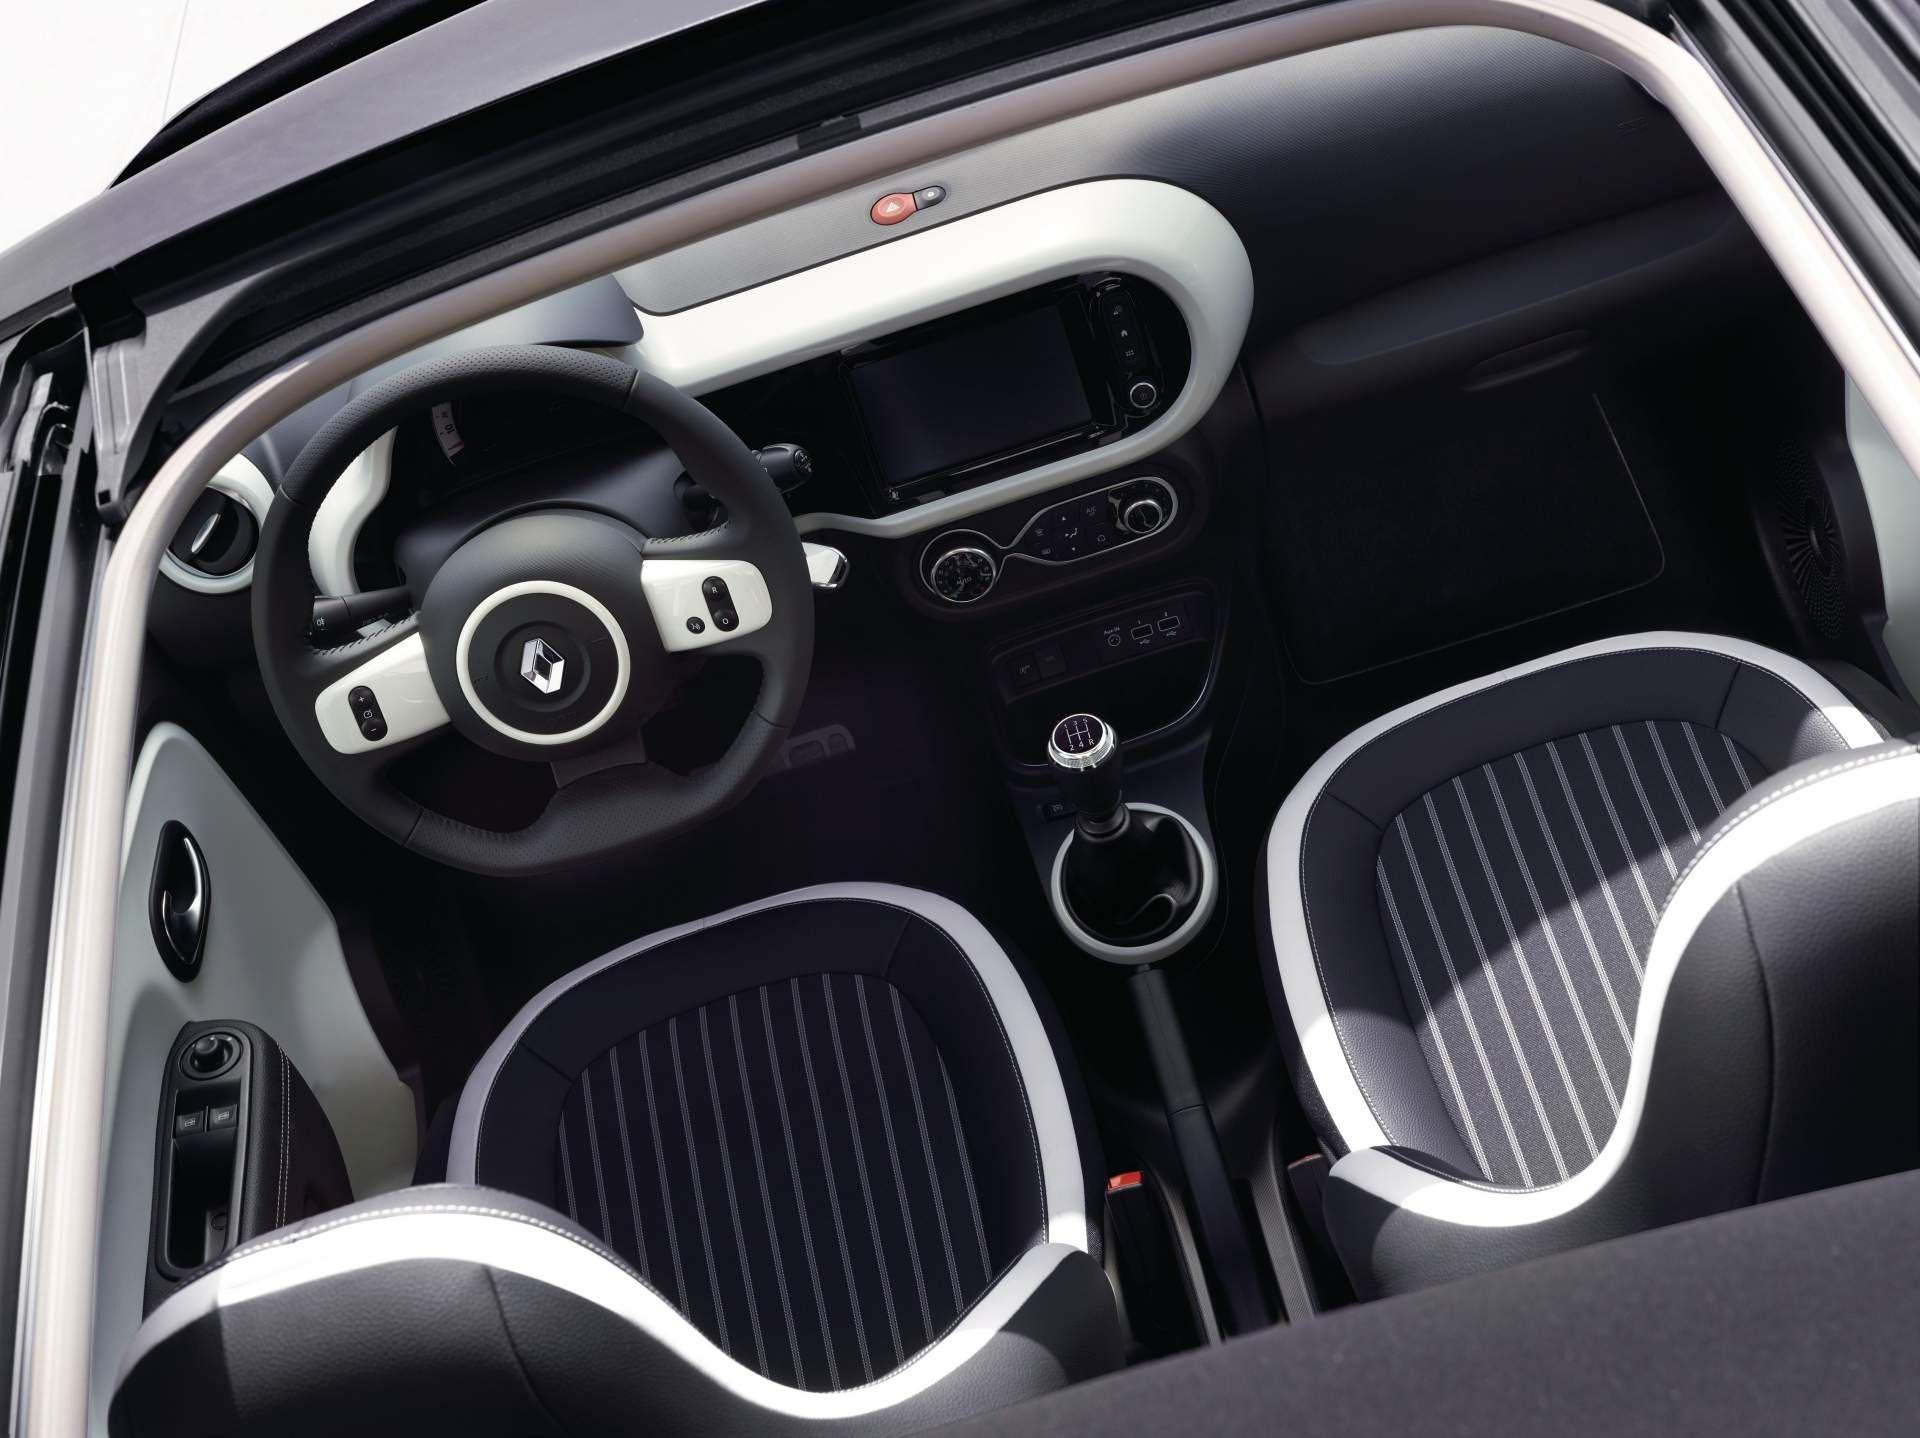 Renault Twingo Gets Subtle Facelift New 1 0l Engine For 2019my